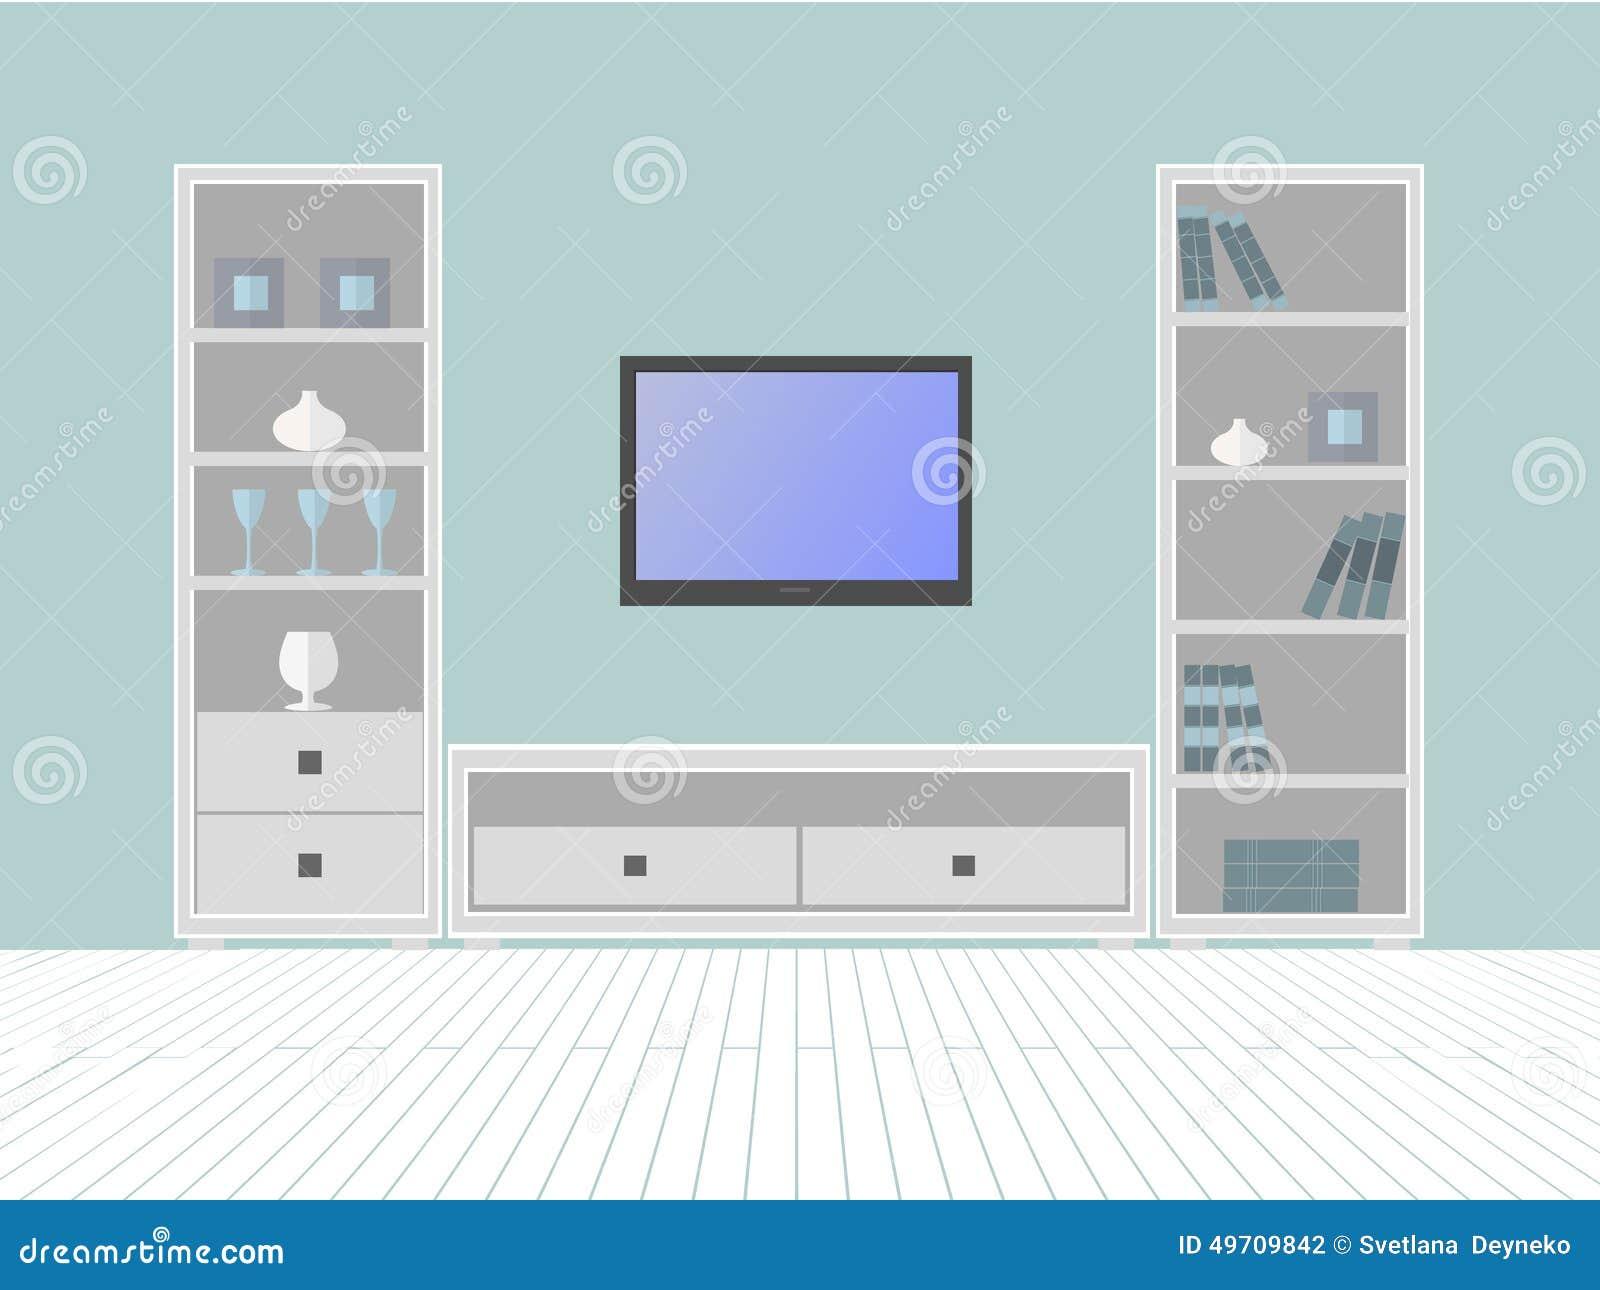 Furniture Box Stock Vector Image 49709842